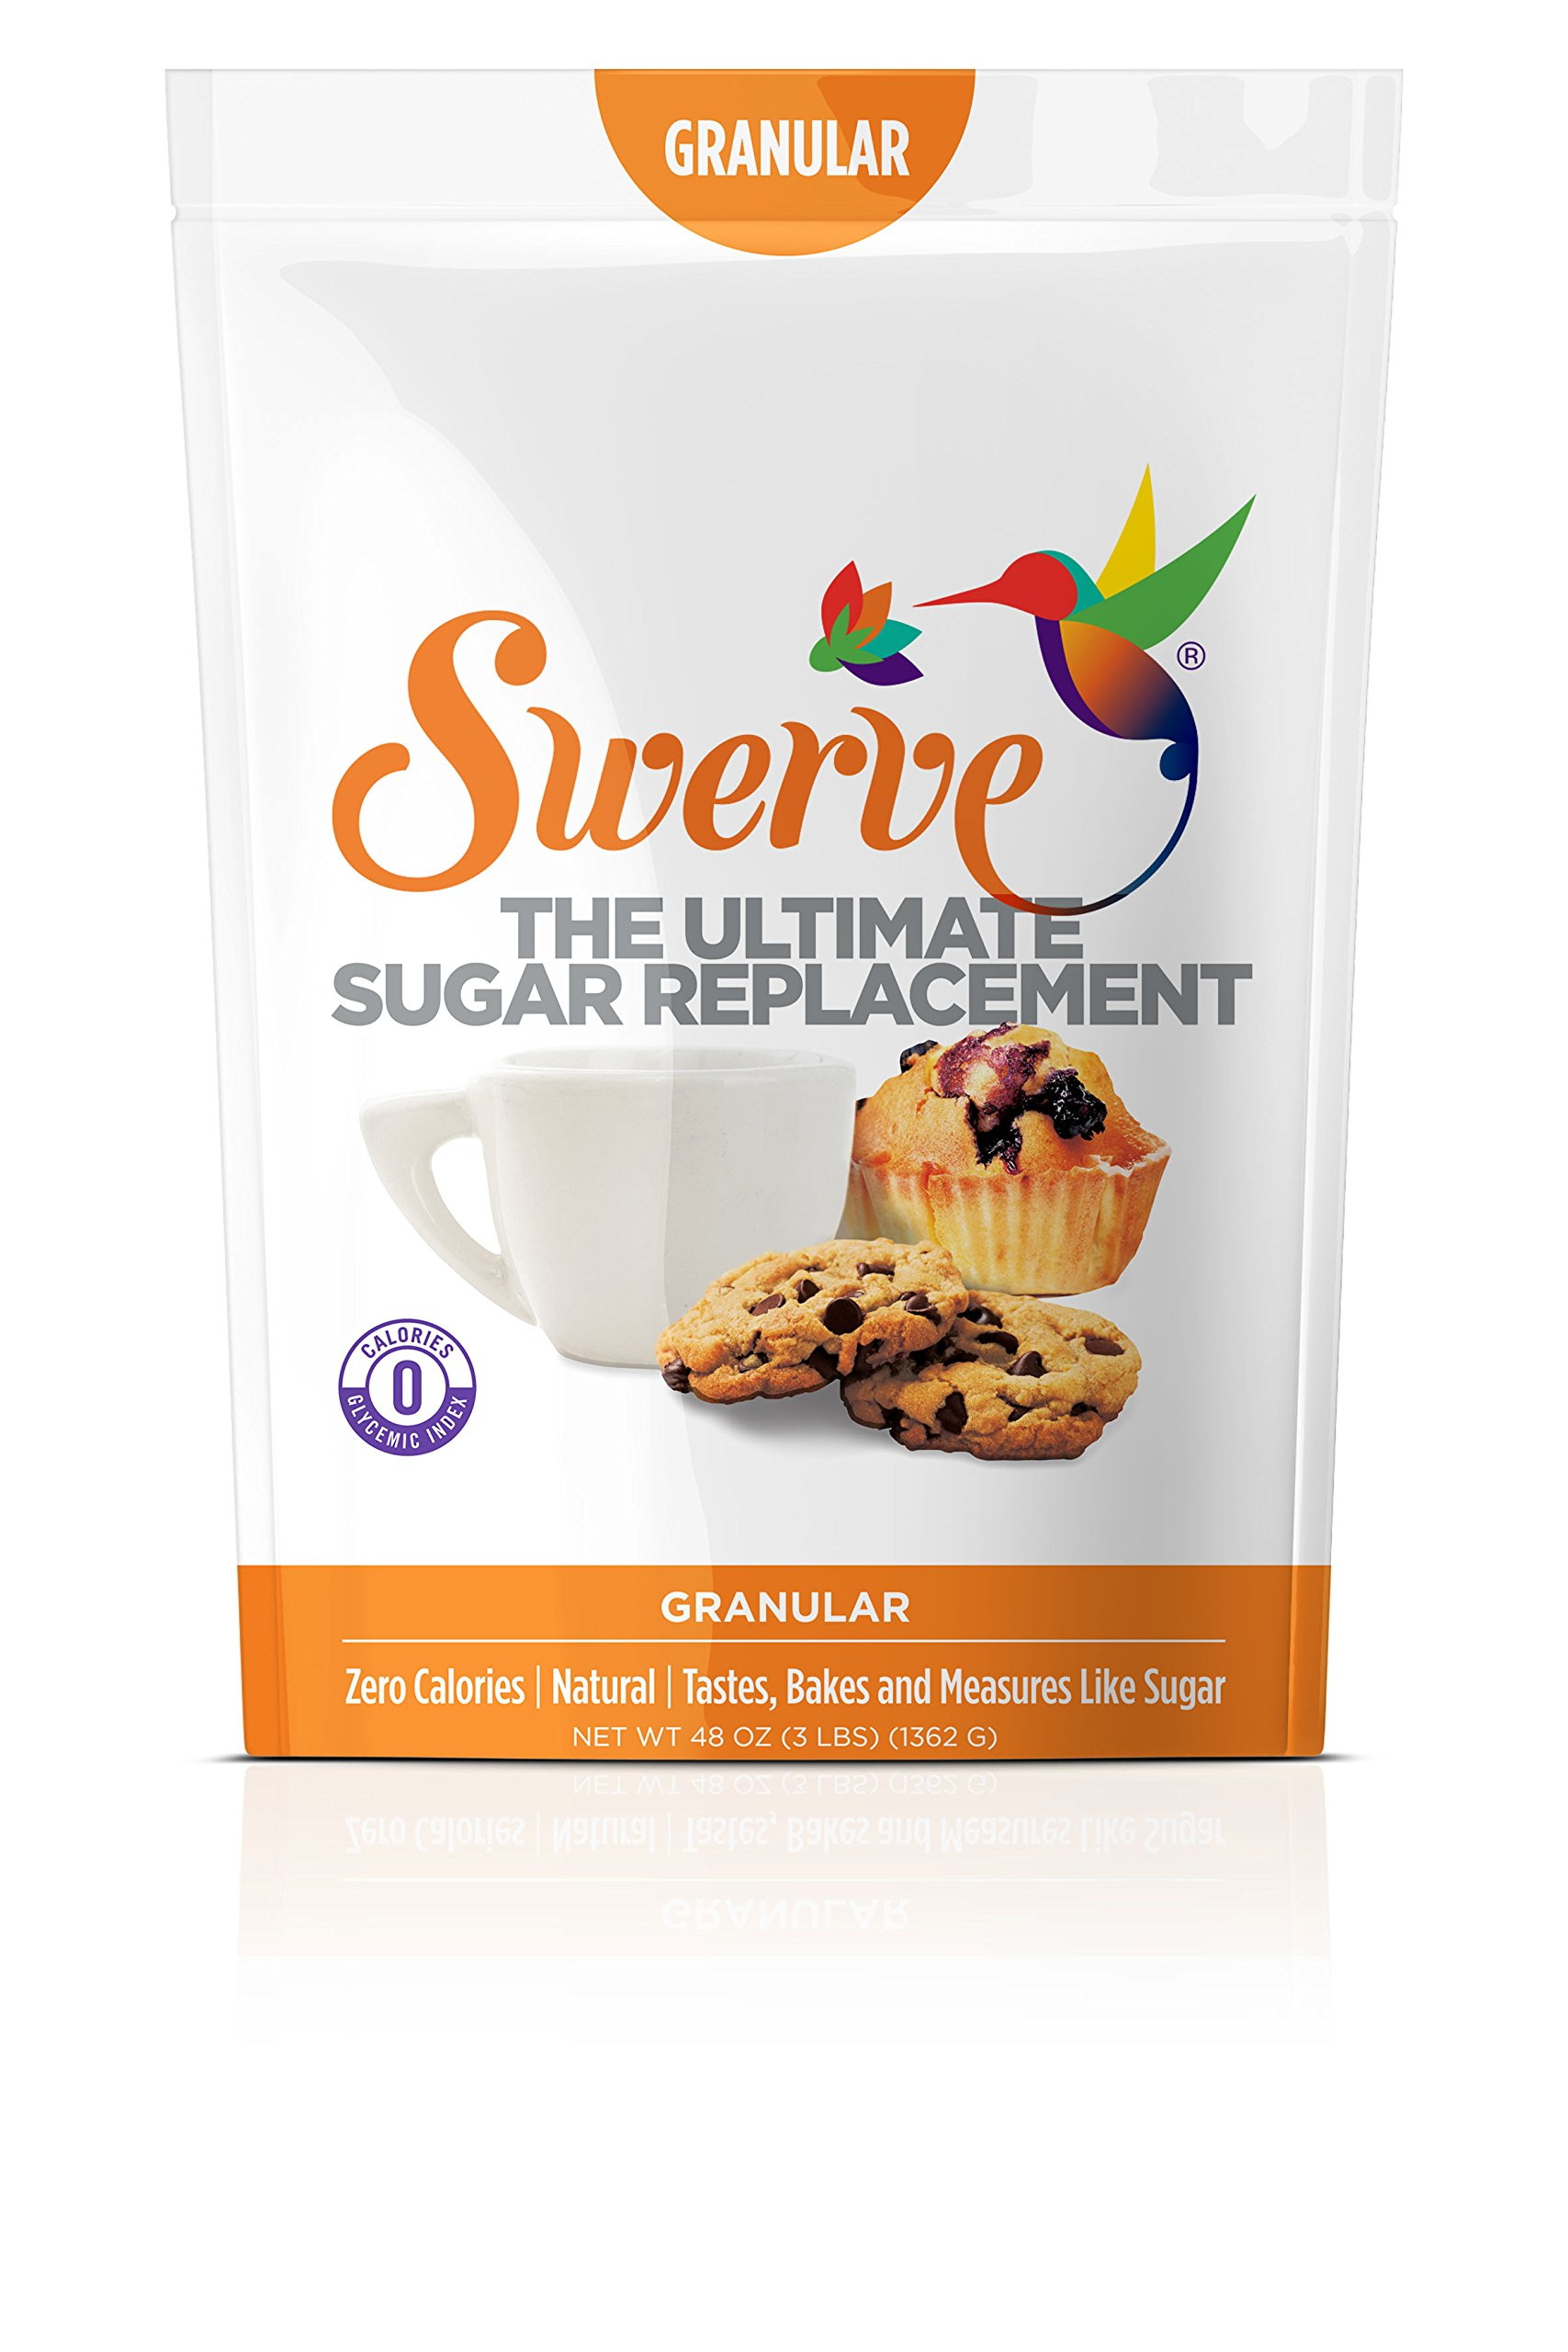 Swerve Granular Sweetener (48 oz): The Ultimate Sugar Replacement